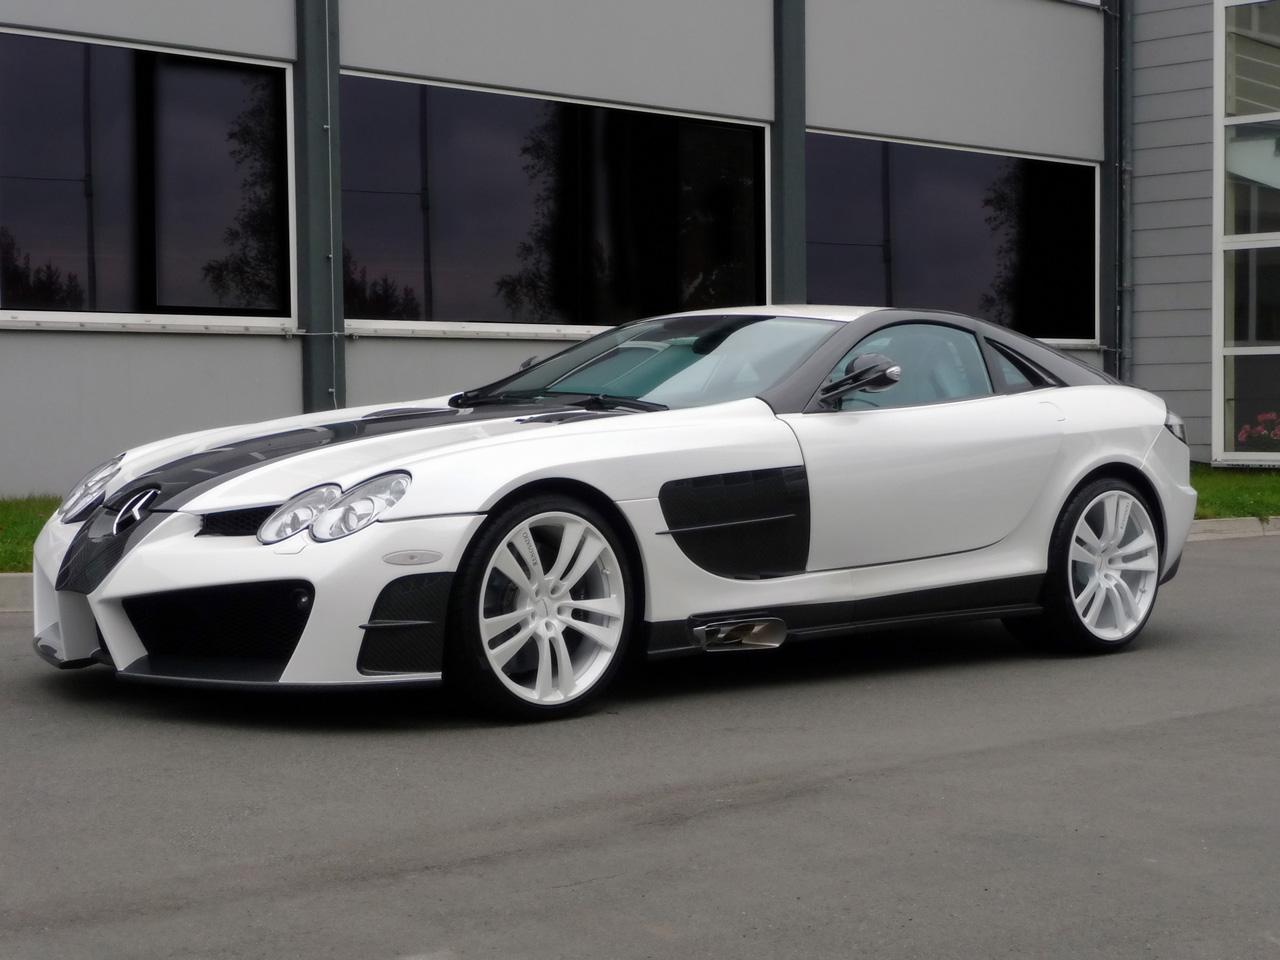 Marche: Mercedes-Benz 2009-Mansory-Mercedes-Benz-McLaren-SLR-Renovatio-Front-And-Side-1280x960